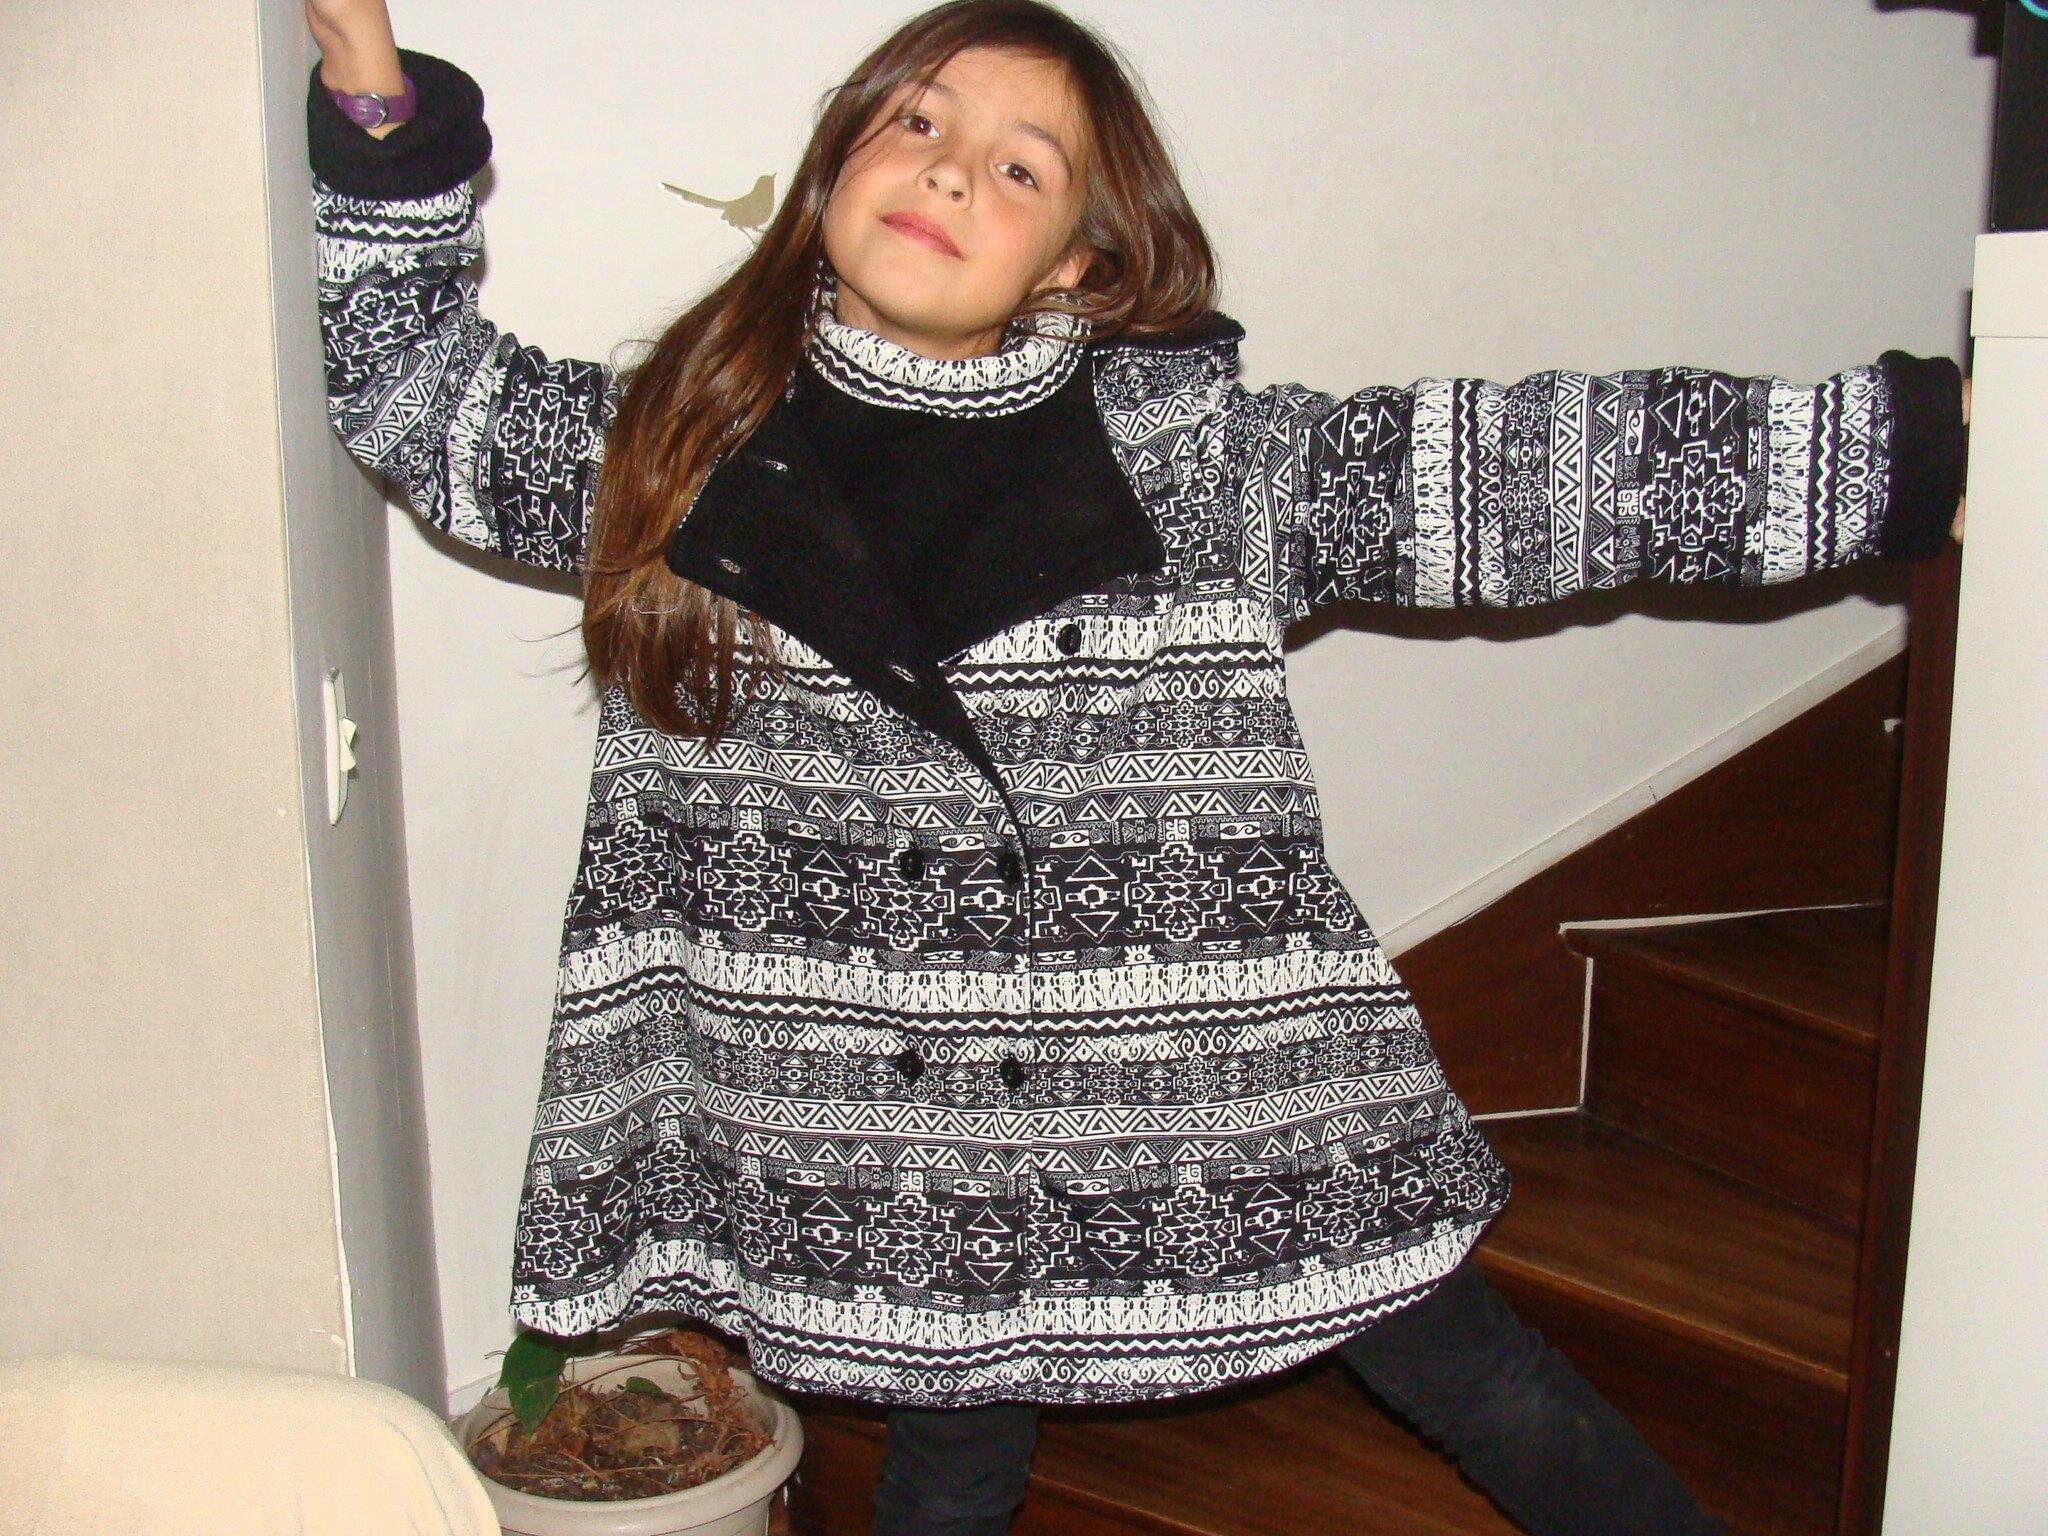 Sydney 12 ans